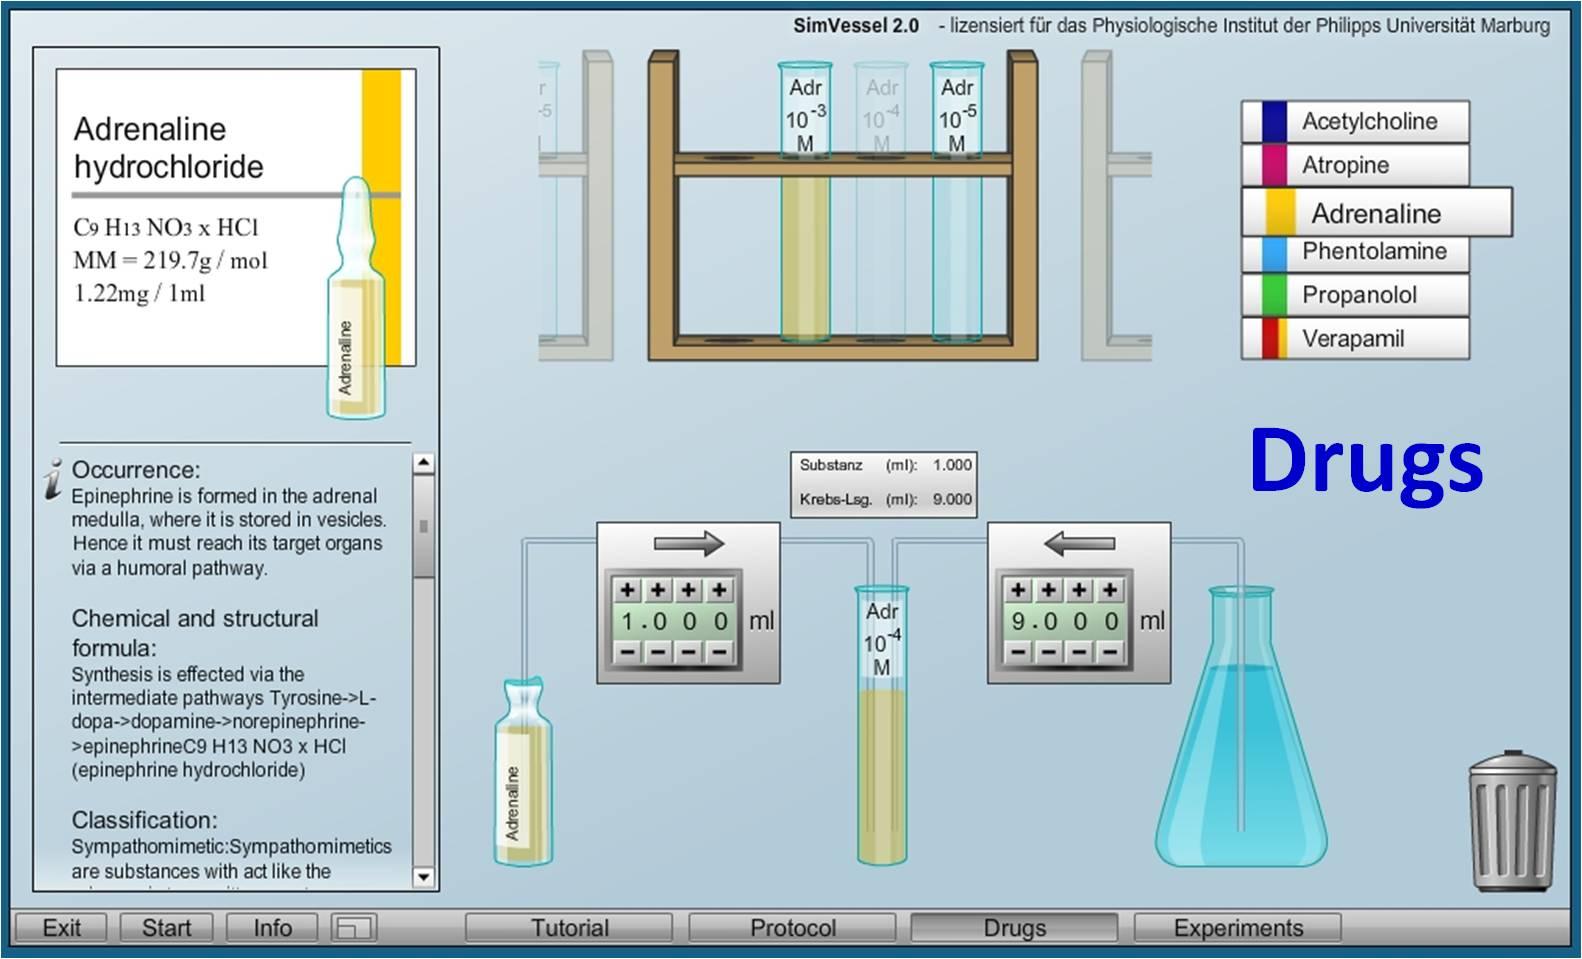 Virtual Physiology - SimVessel